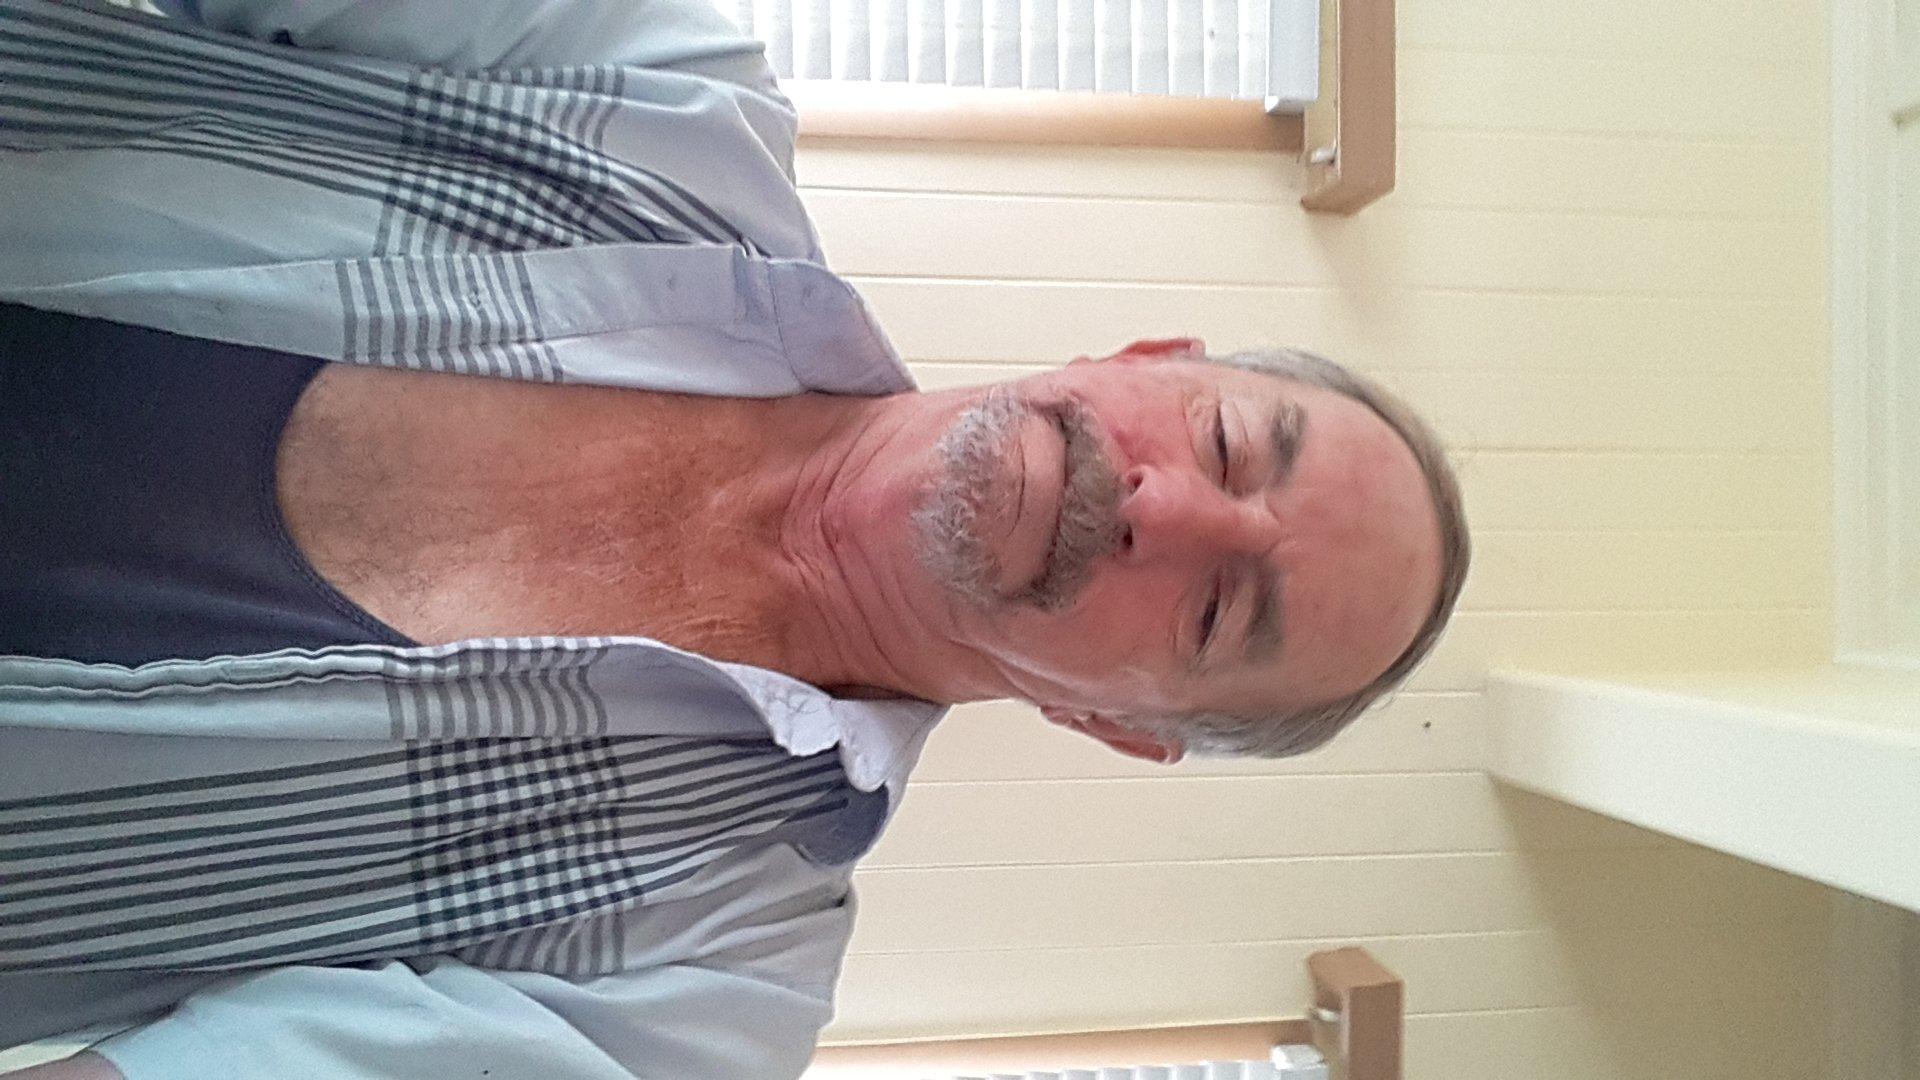 NaughtyCaretaker from Queensland,Australia